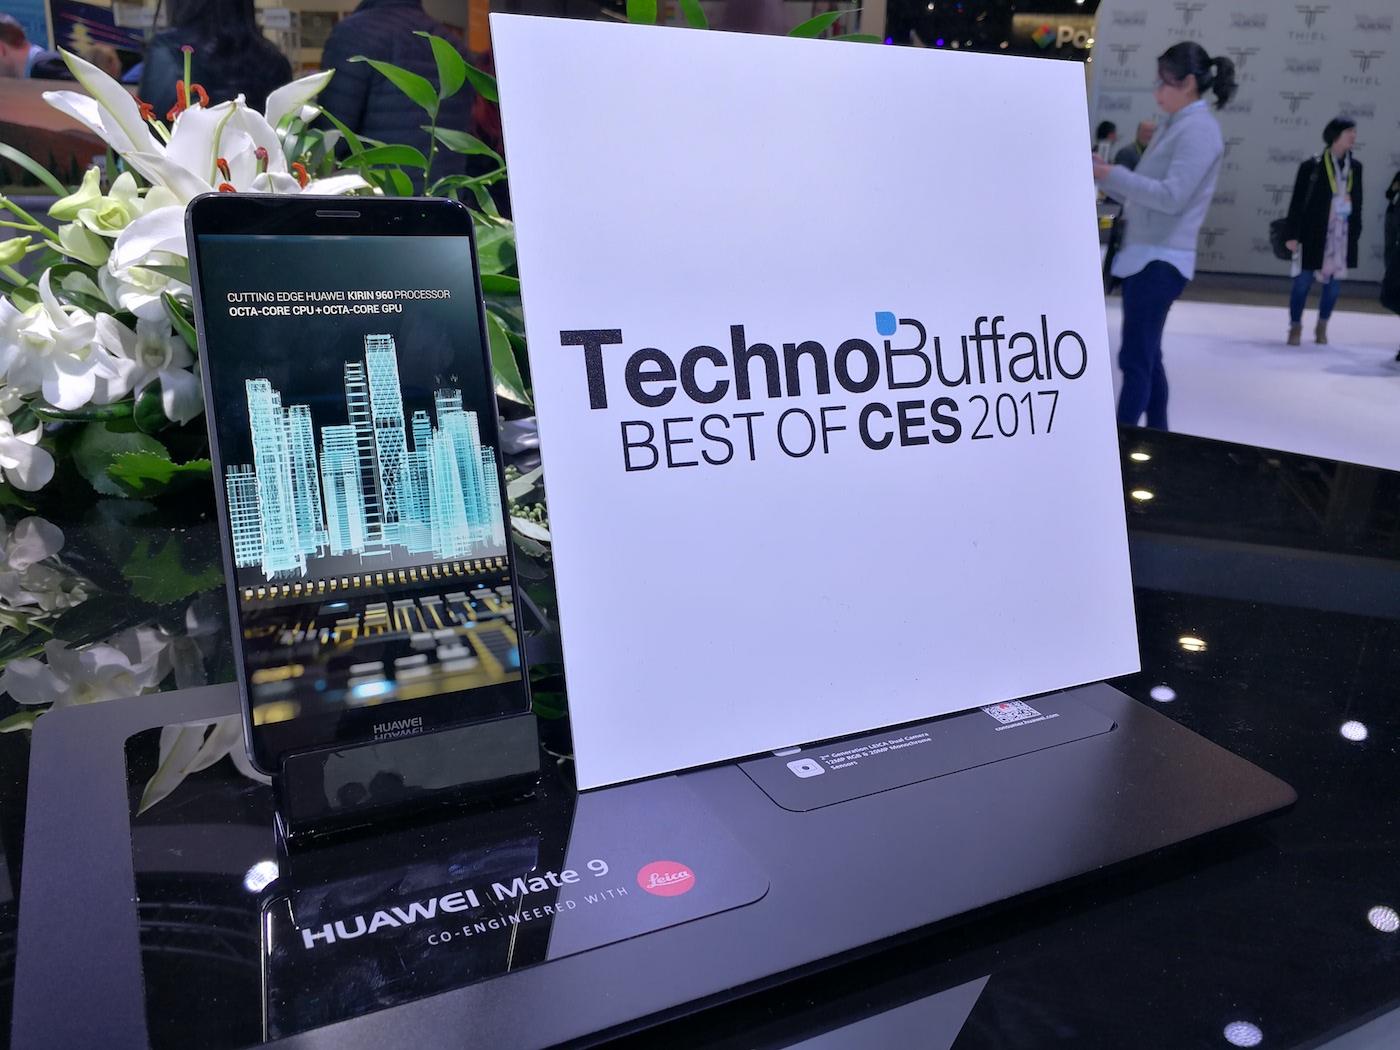 Huawei Mate 9 TechnoBuffalo CES 2017 award